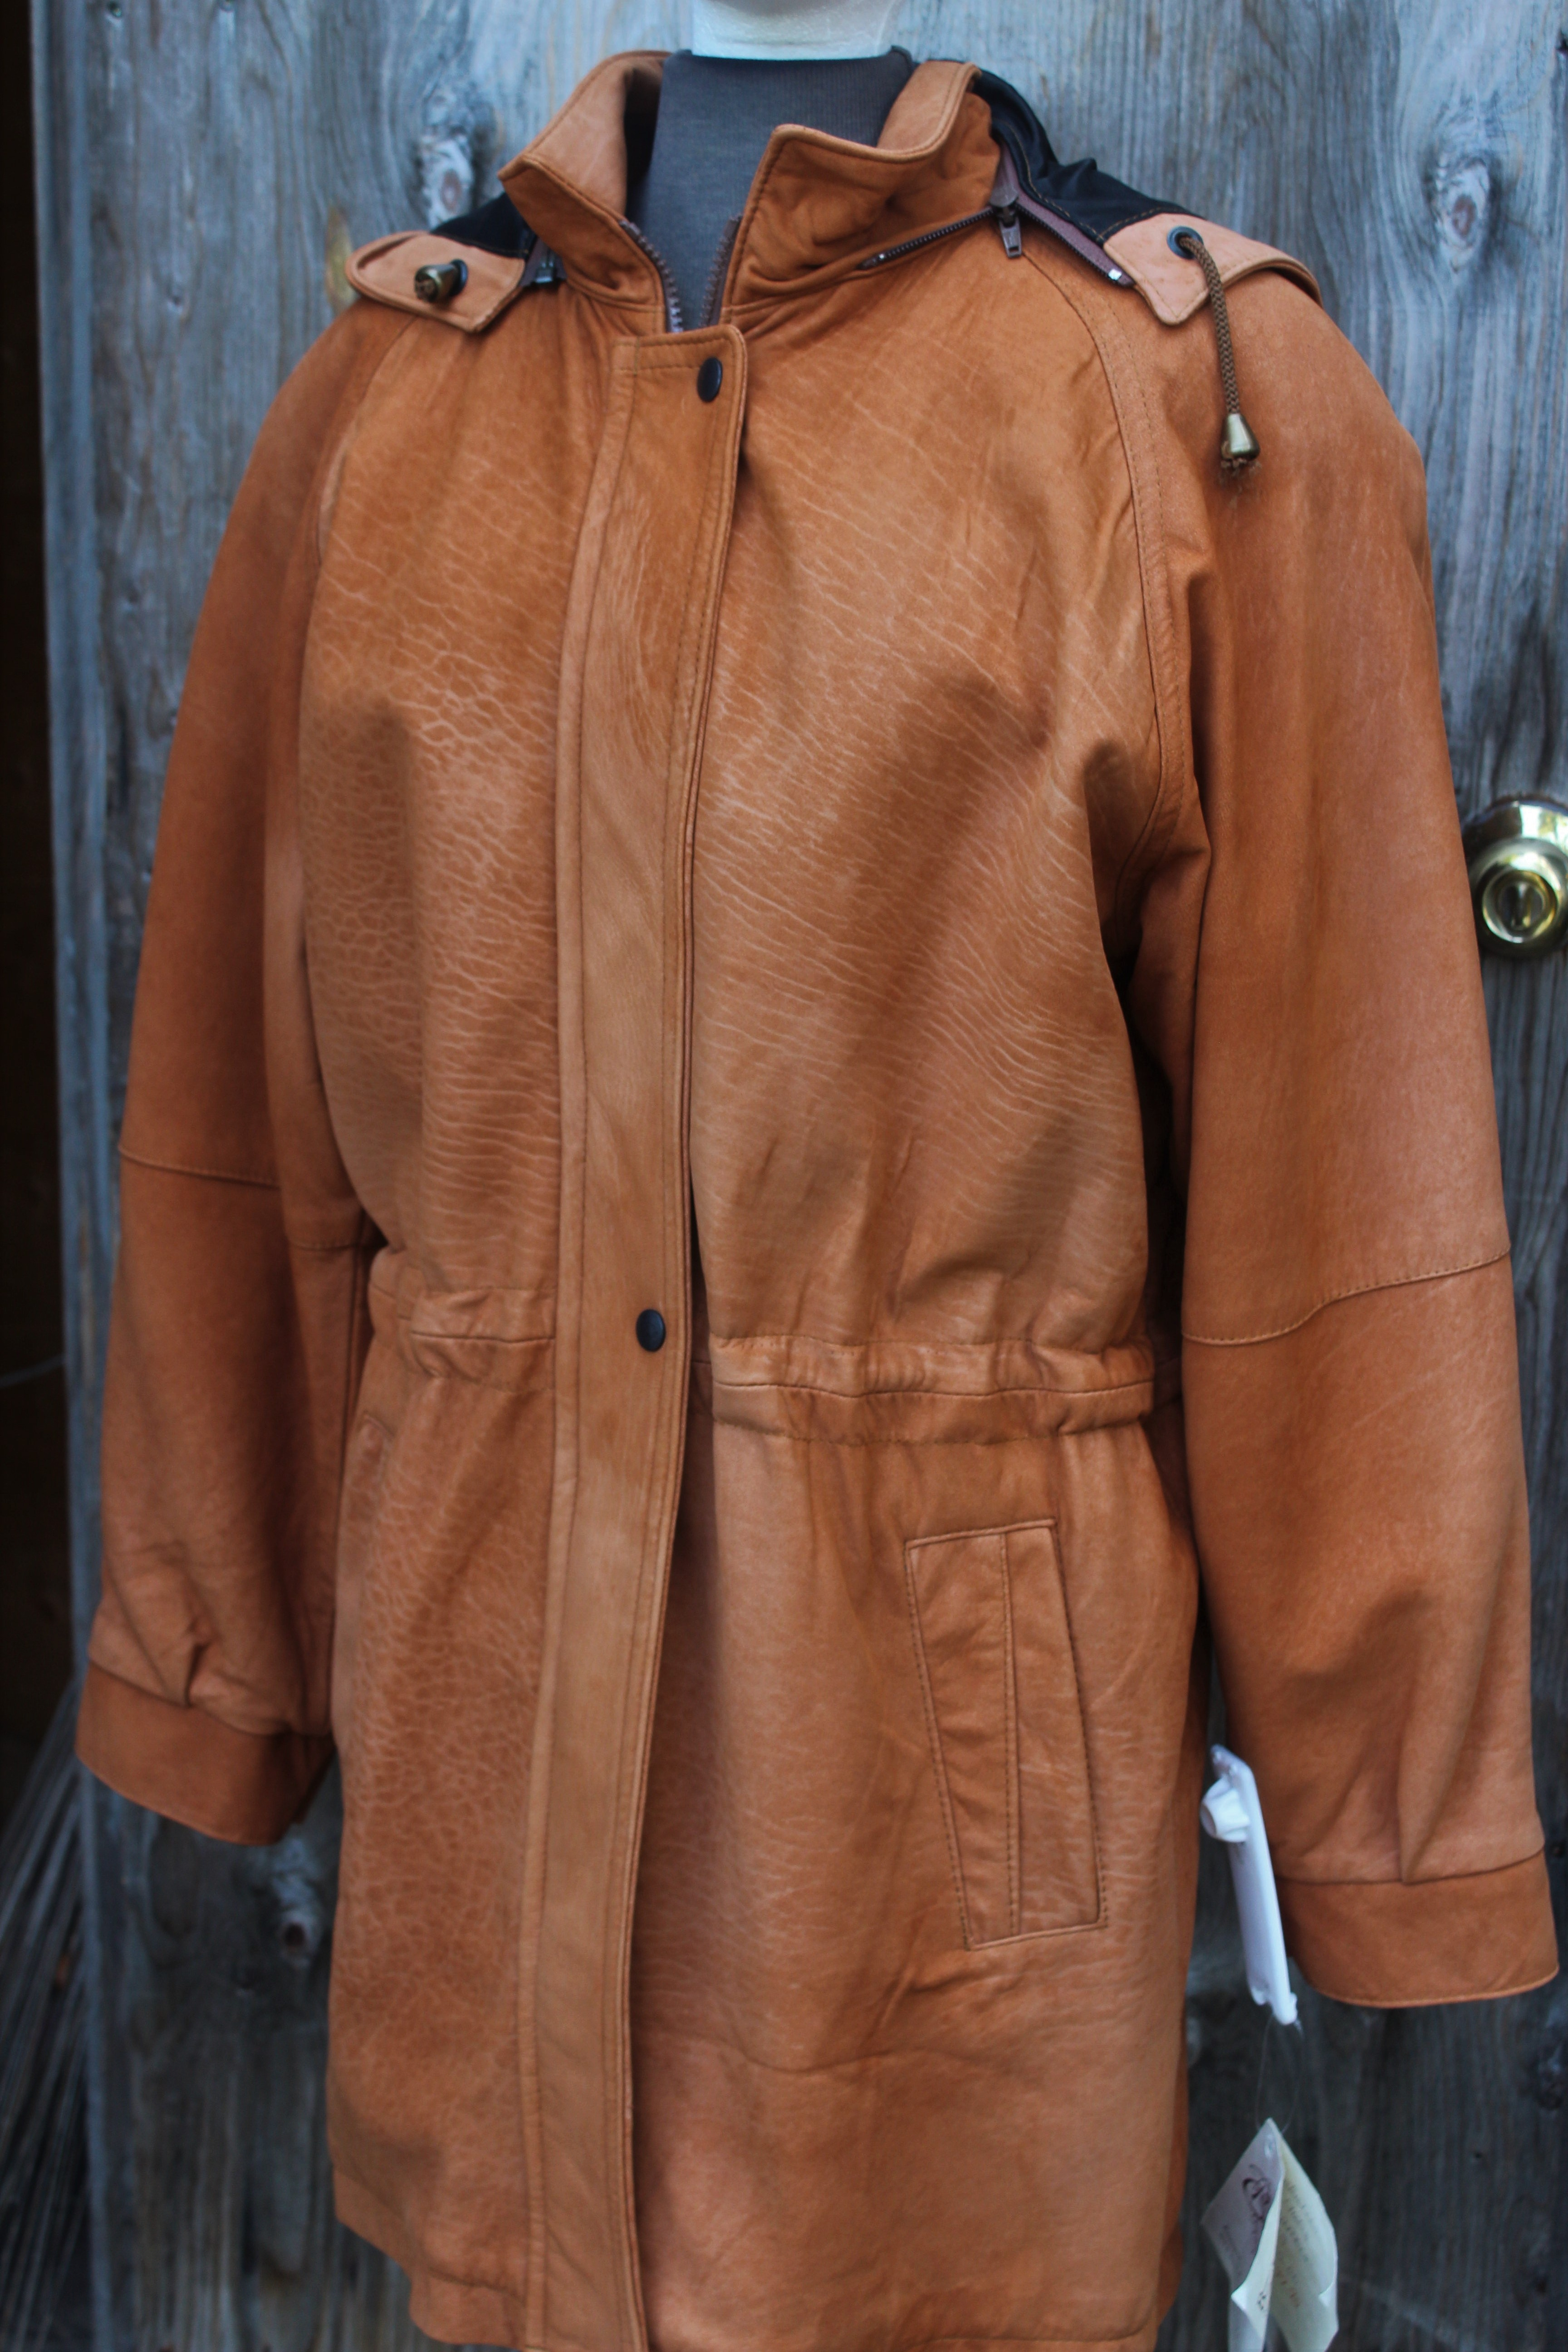 Chamois- $439.95 Bainton's: Style #9608